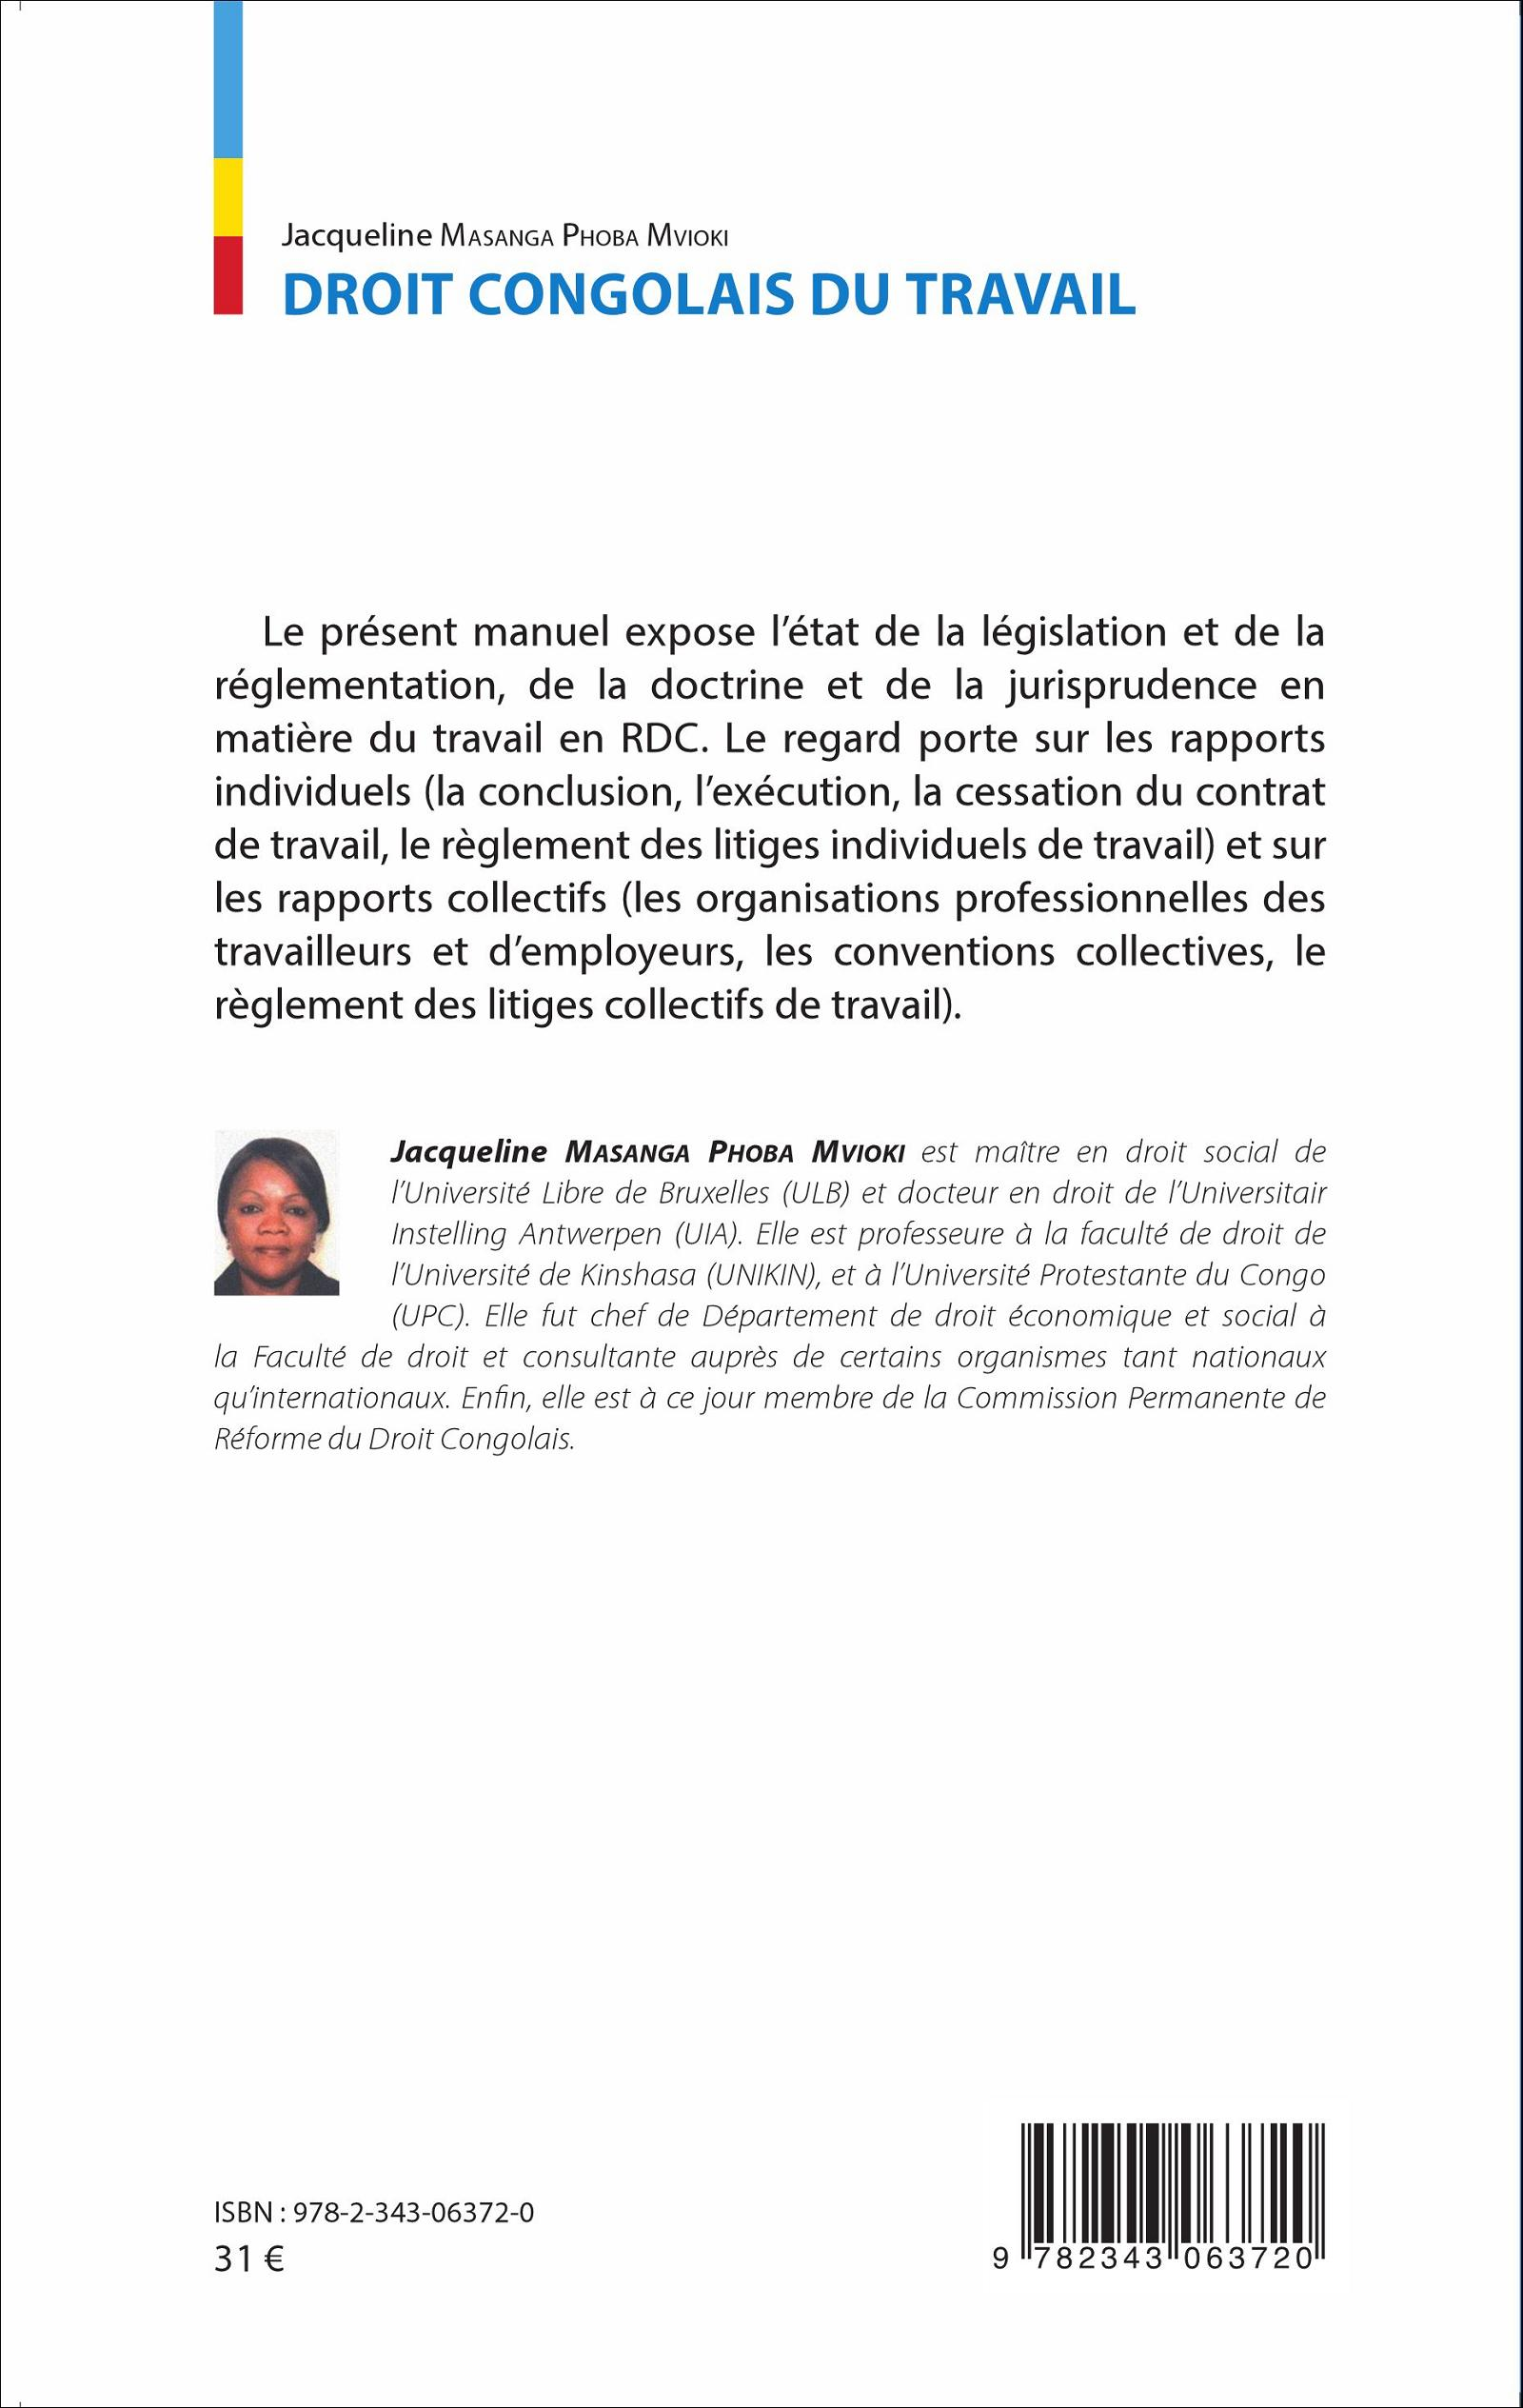 DROIT CONGOLAIS DU TRAVAIL, Jacqueline Masanga Phoba Mvioki